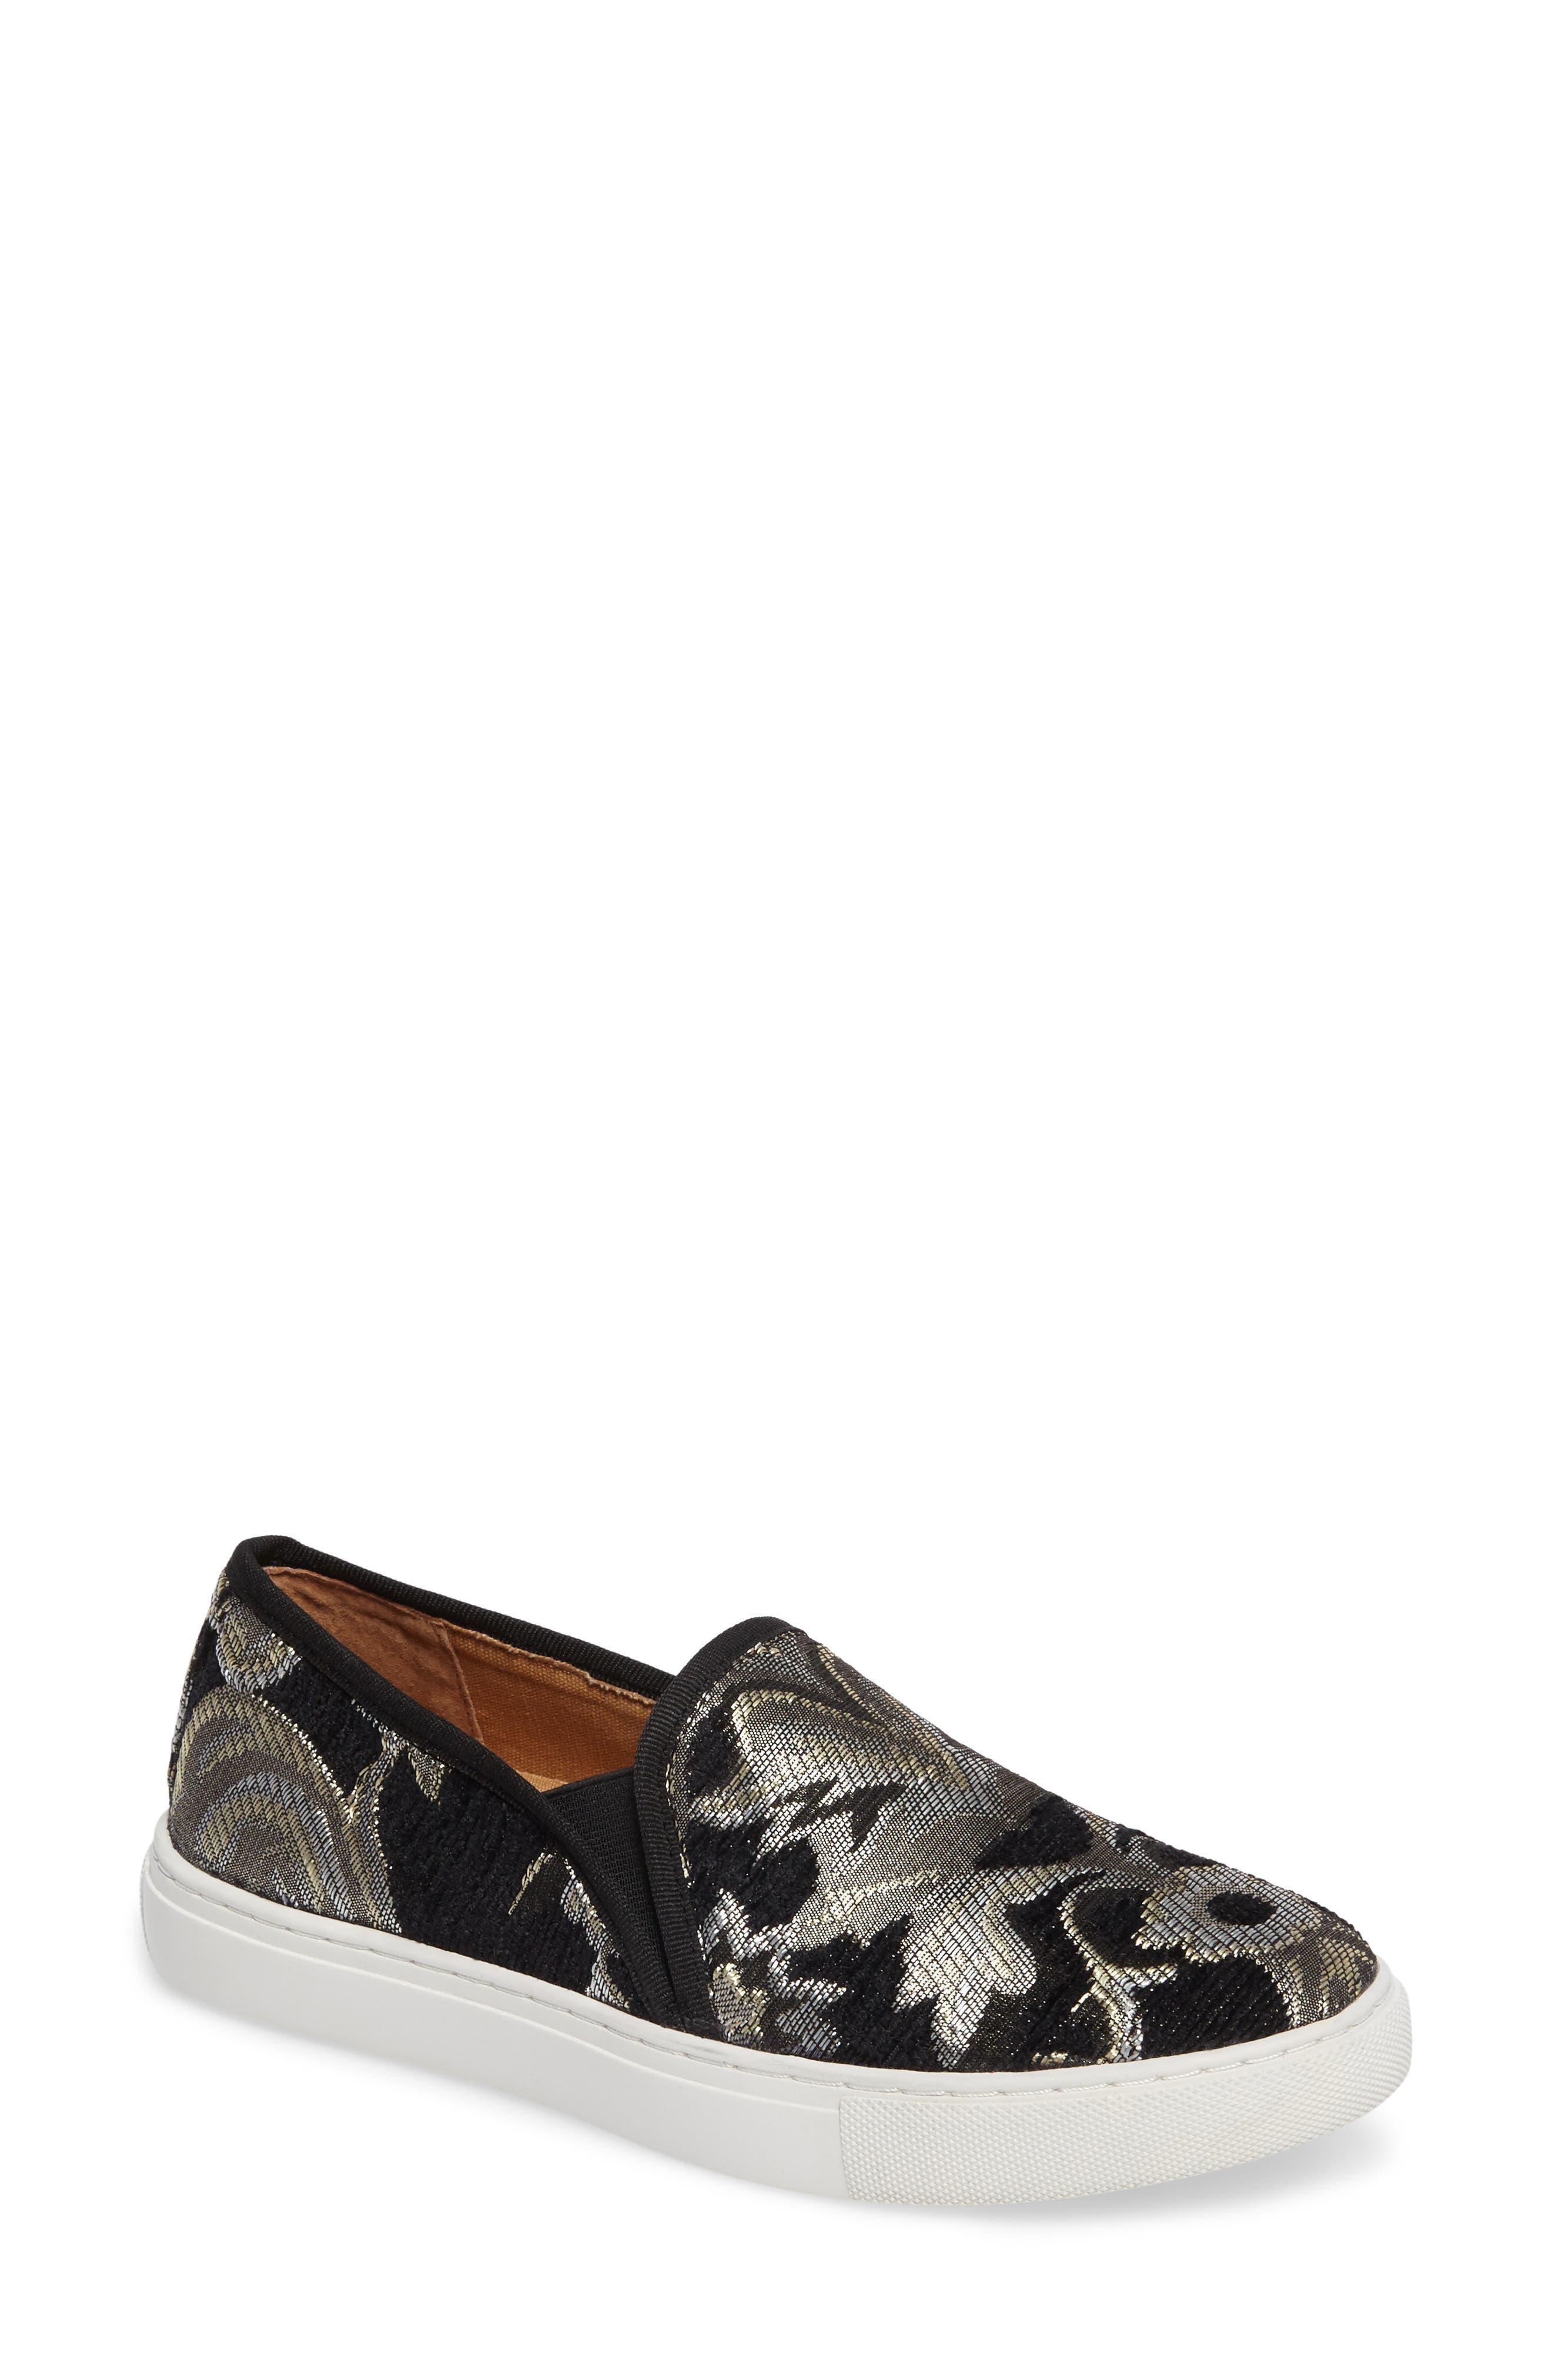 Skipper Slip-On Sneaker,                         Main,                         color, Black Brocade Leather